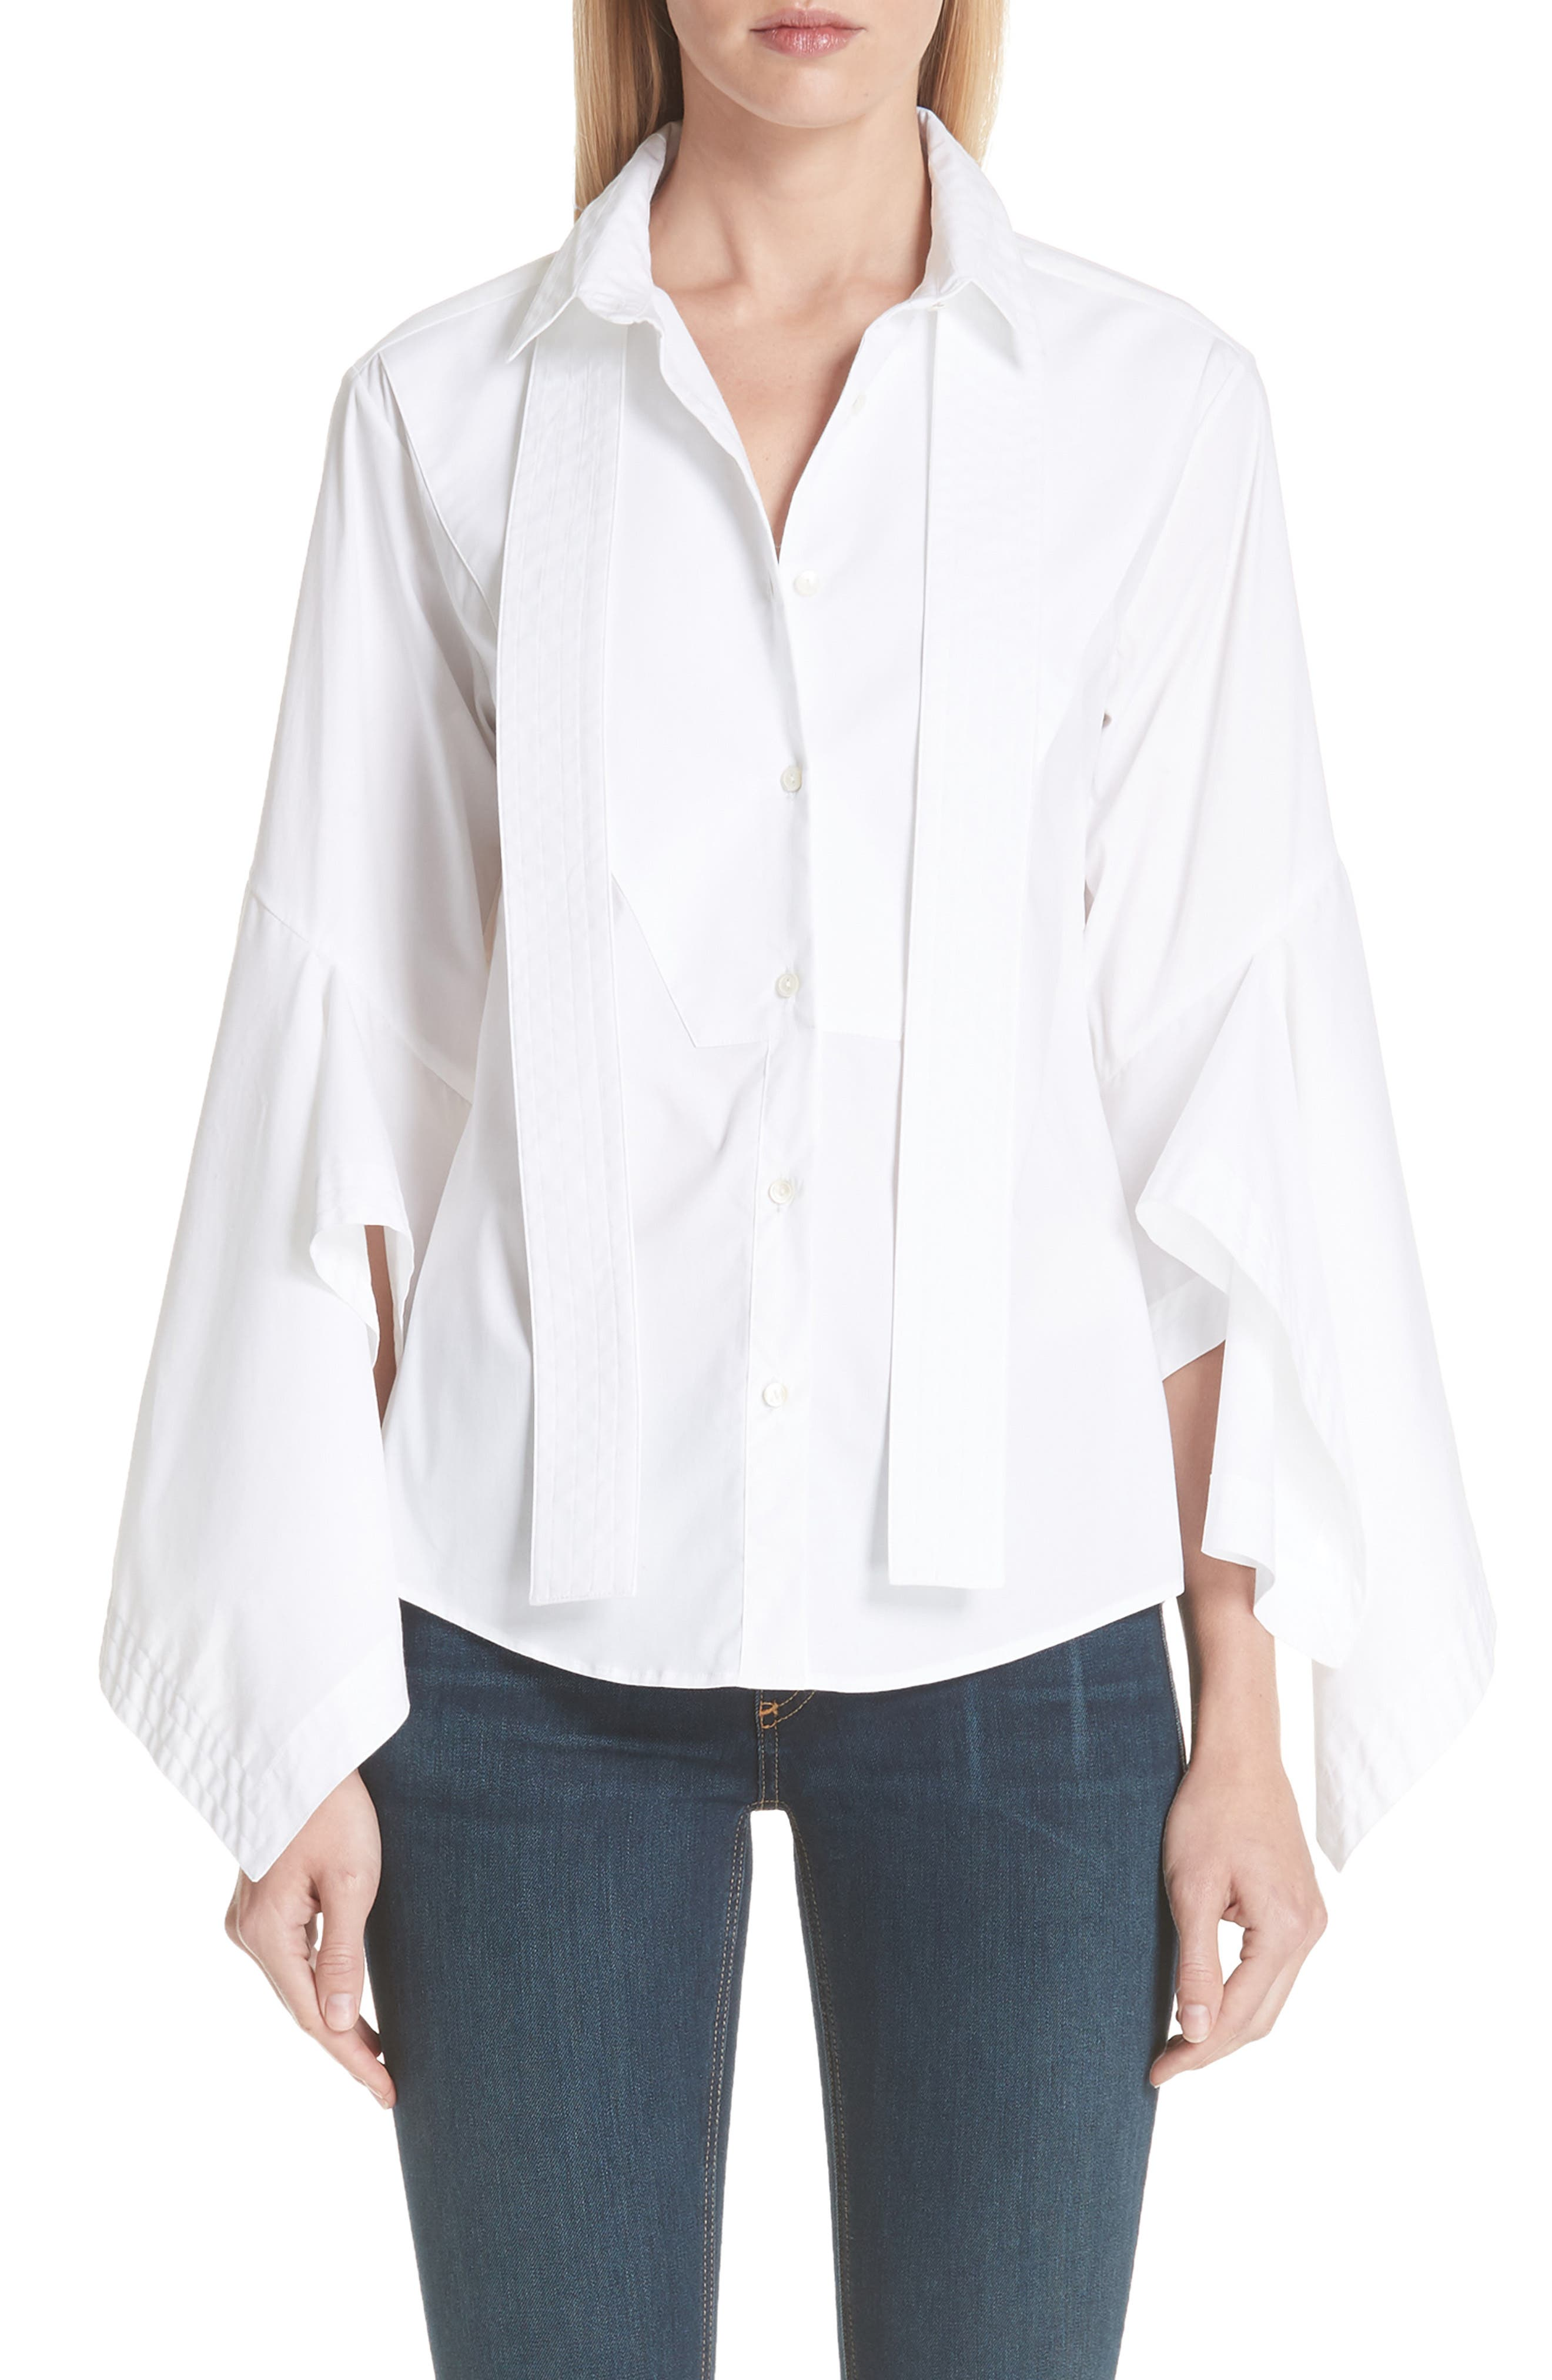 PALMER/HARDING Ruffle Sleeve Blouse, Main, color, 100